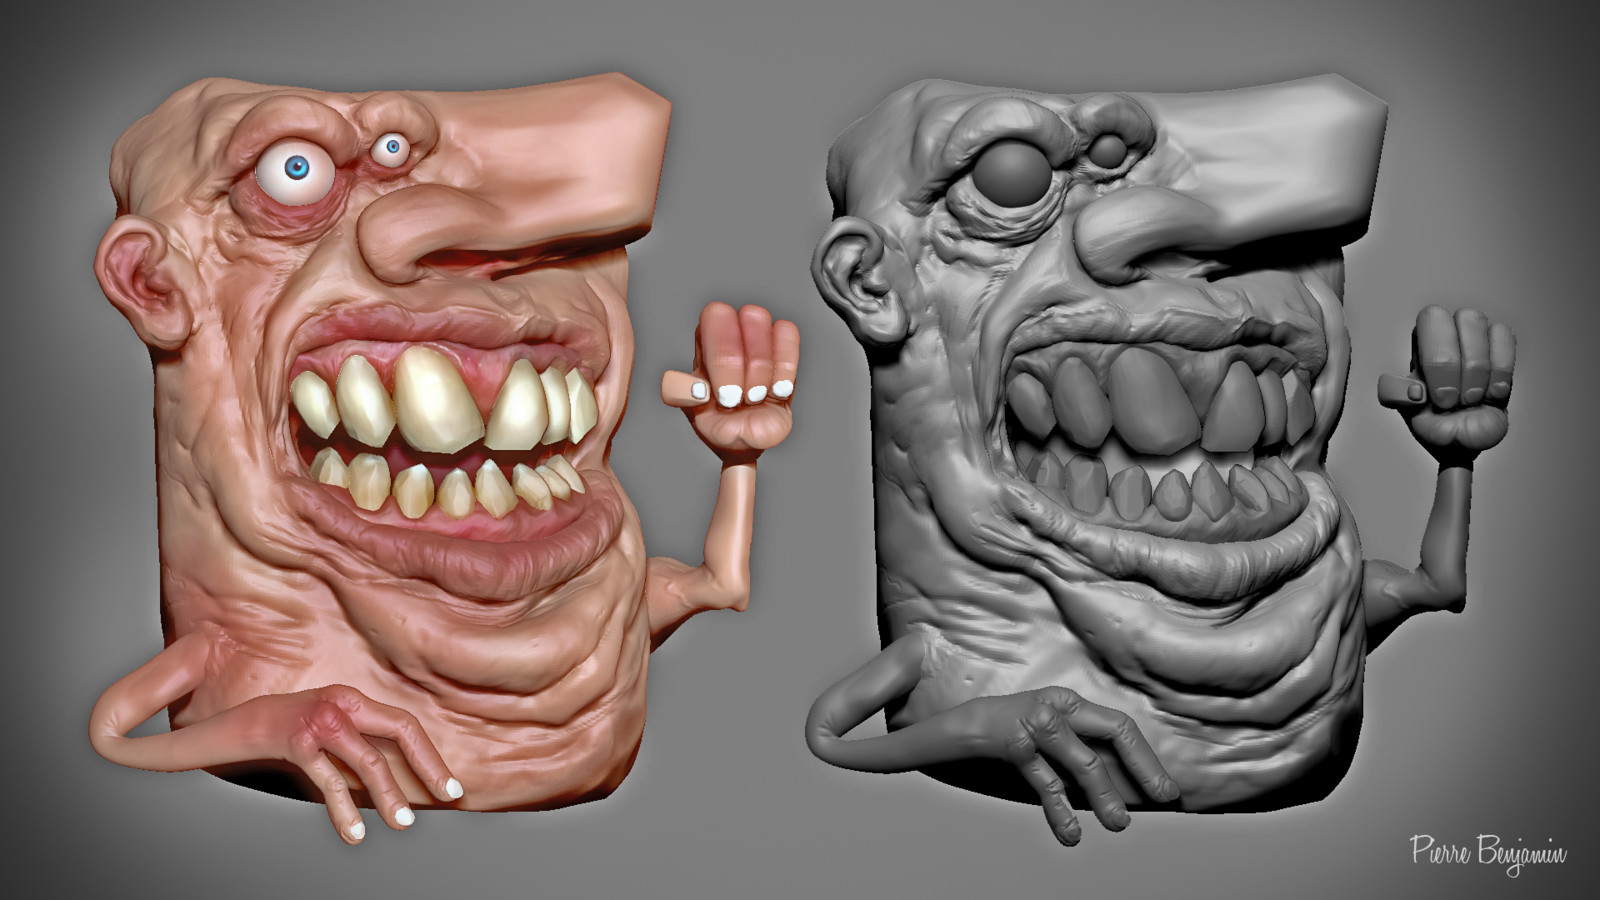 3D ZBrush sculpt based on an original concept by Numero 6 - fan Art